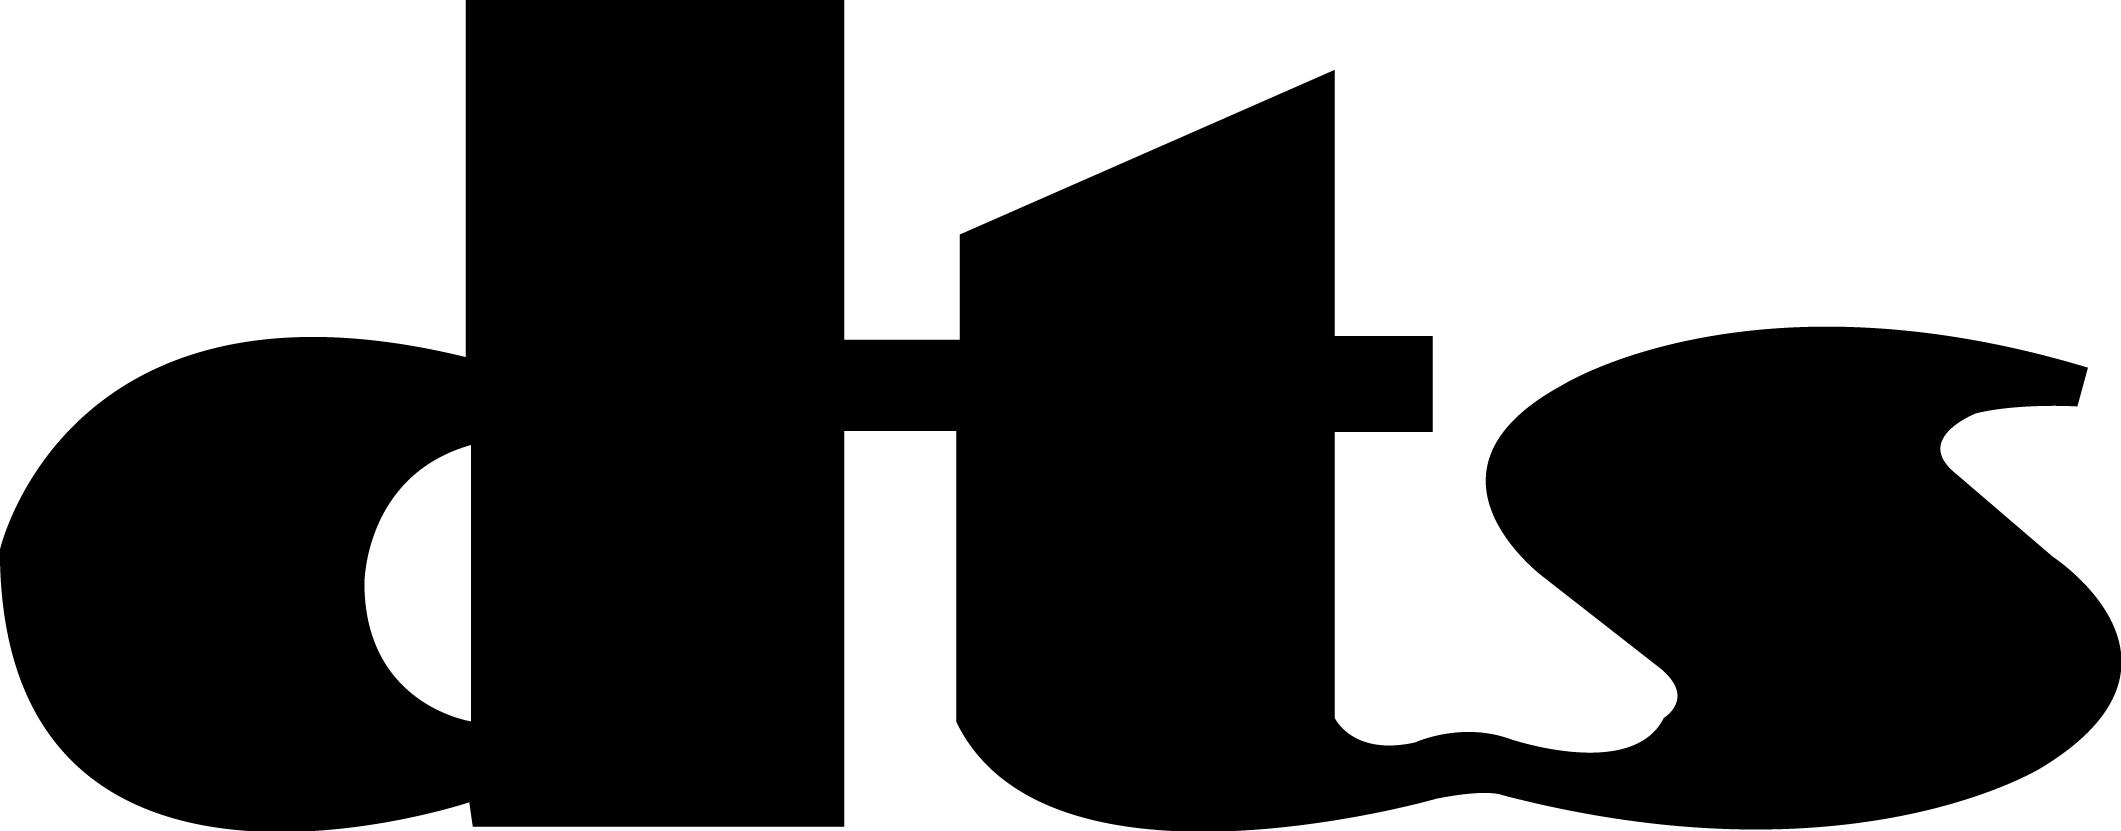 free dvd logo clip art - photo #41